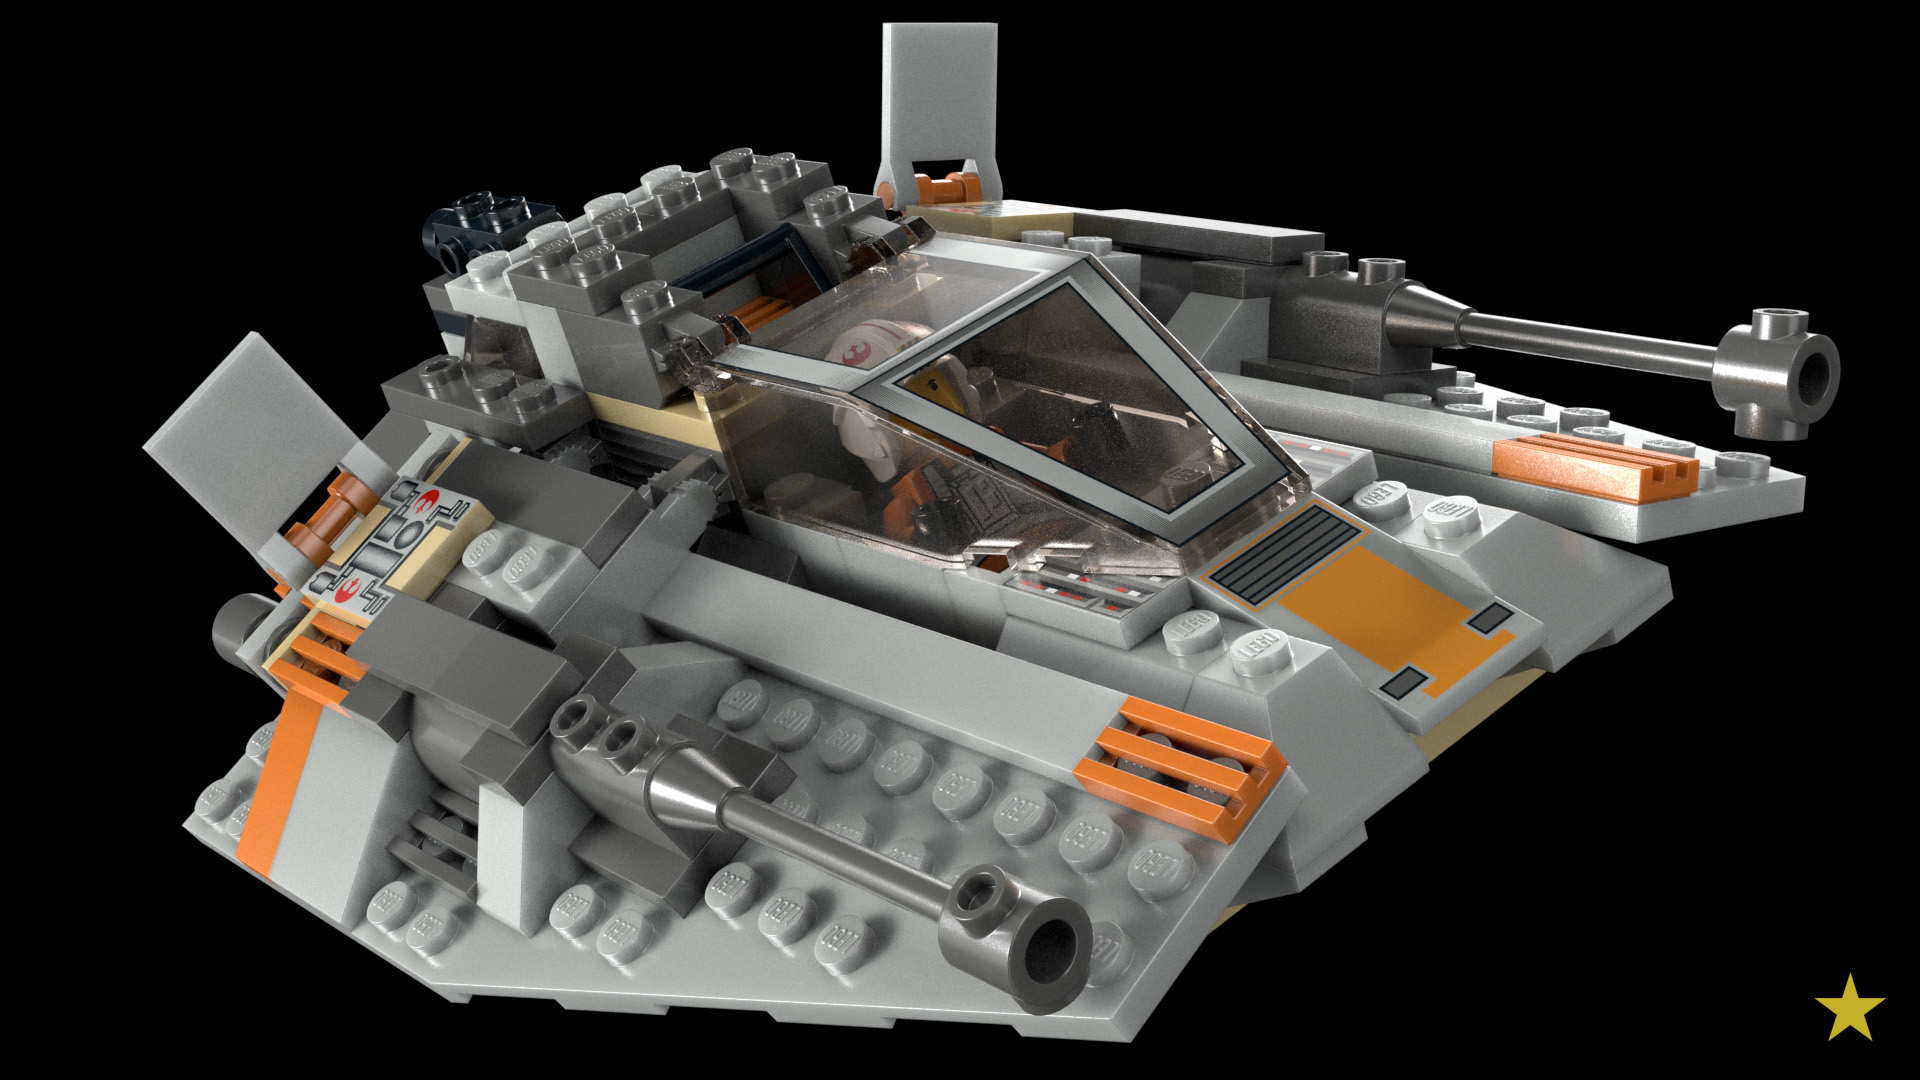 7130_Snowspeeder_Normal_Studs_v03c_LEGO_RGB_Wide.jpg